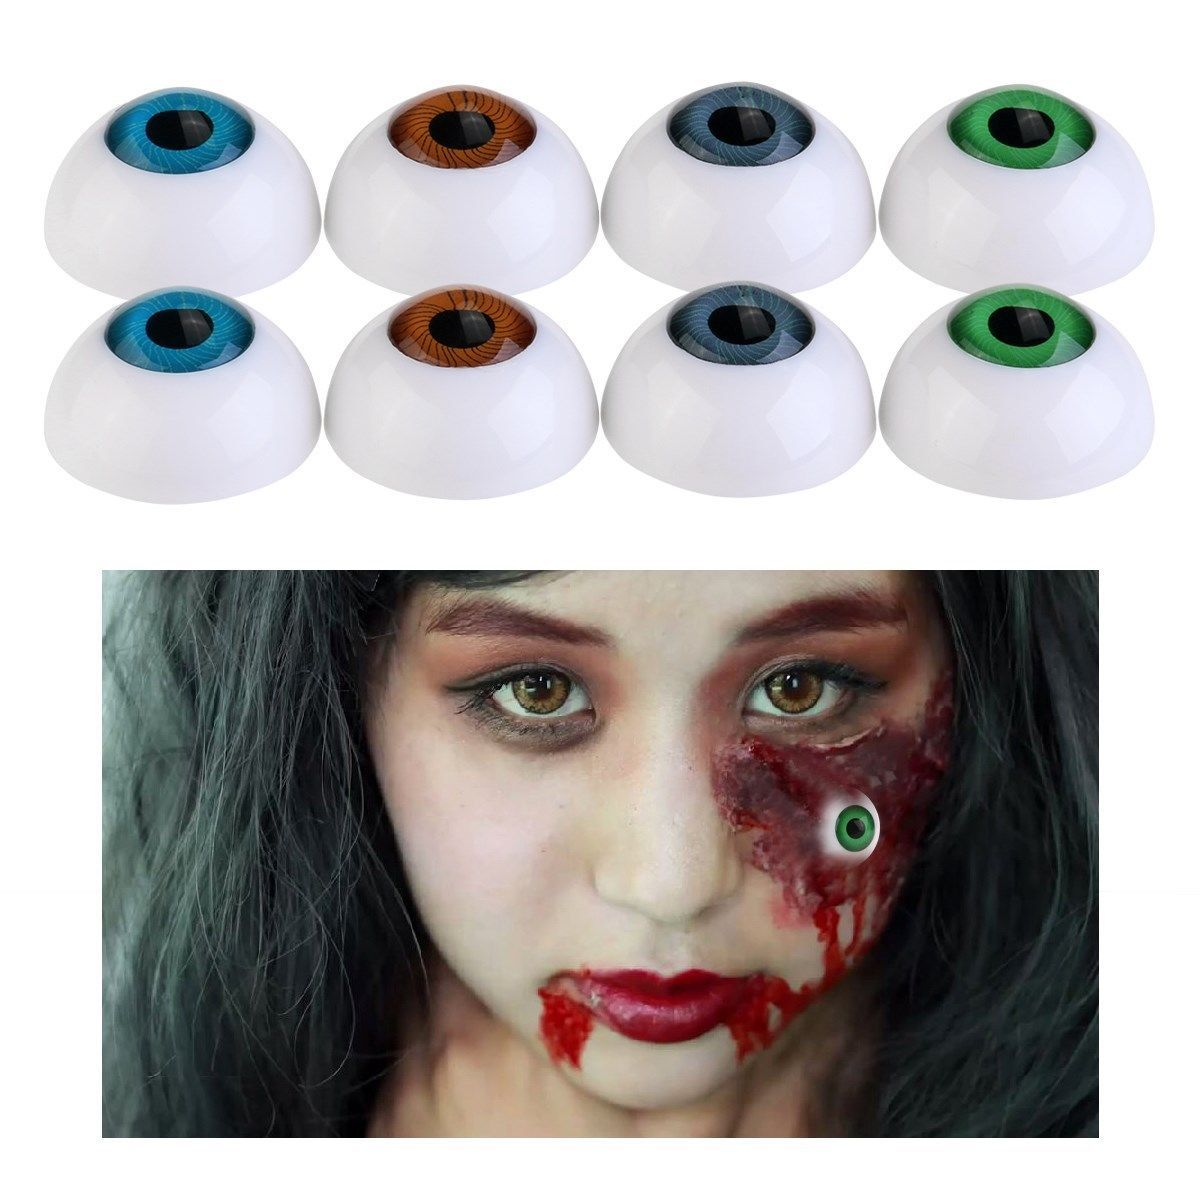 5 Pair Plastic Half Round For Halloween Mask Doll Eyes Fake Mask Eyeballs YnSP